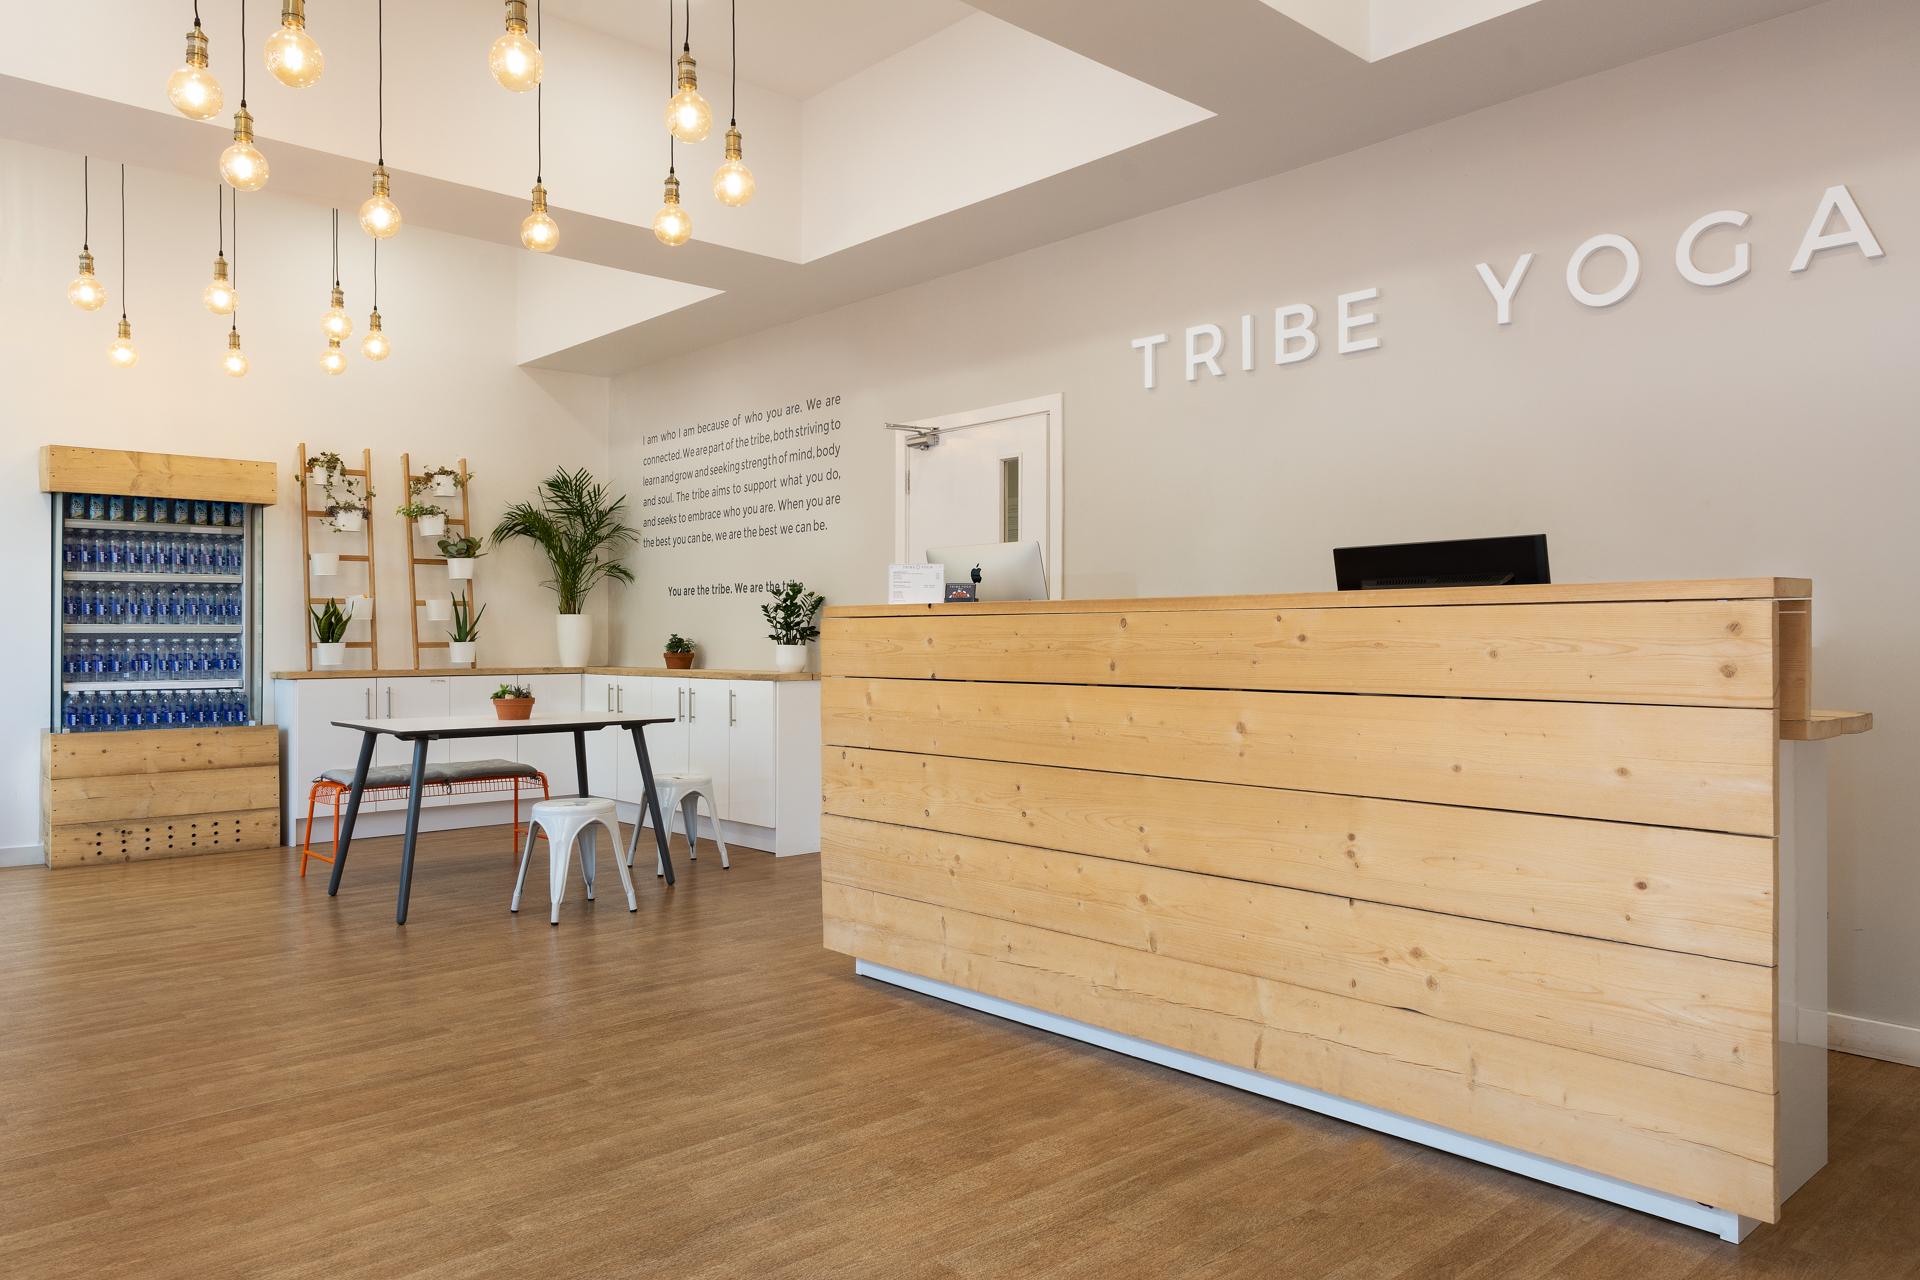 Tribe Yoga Leith Walk Edinburgh